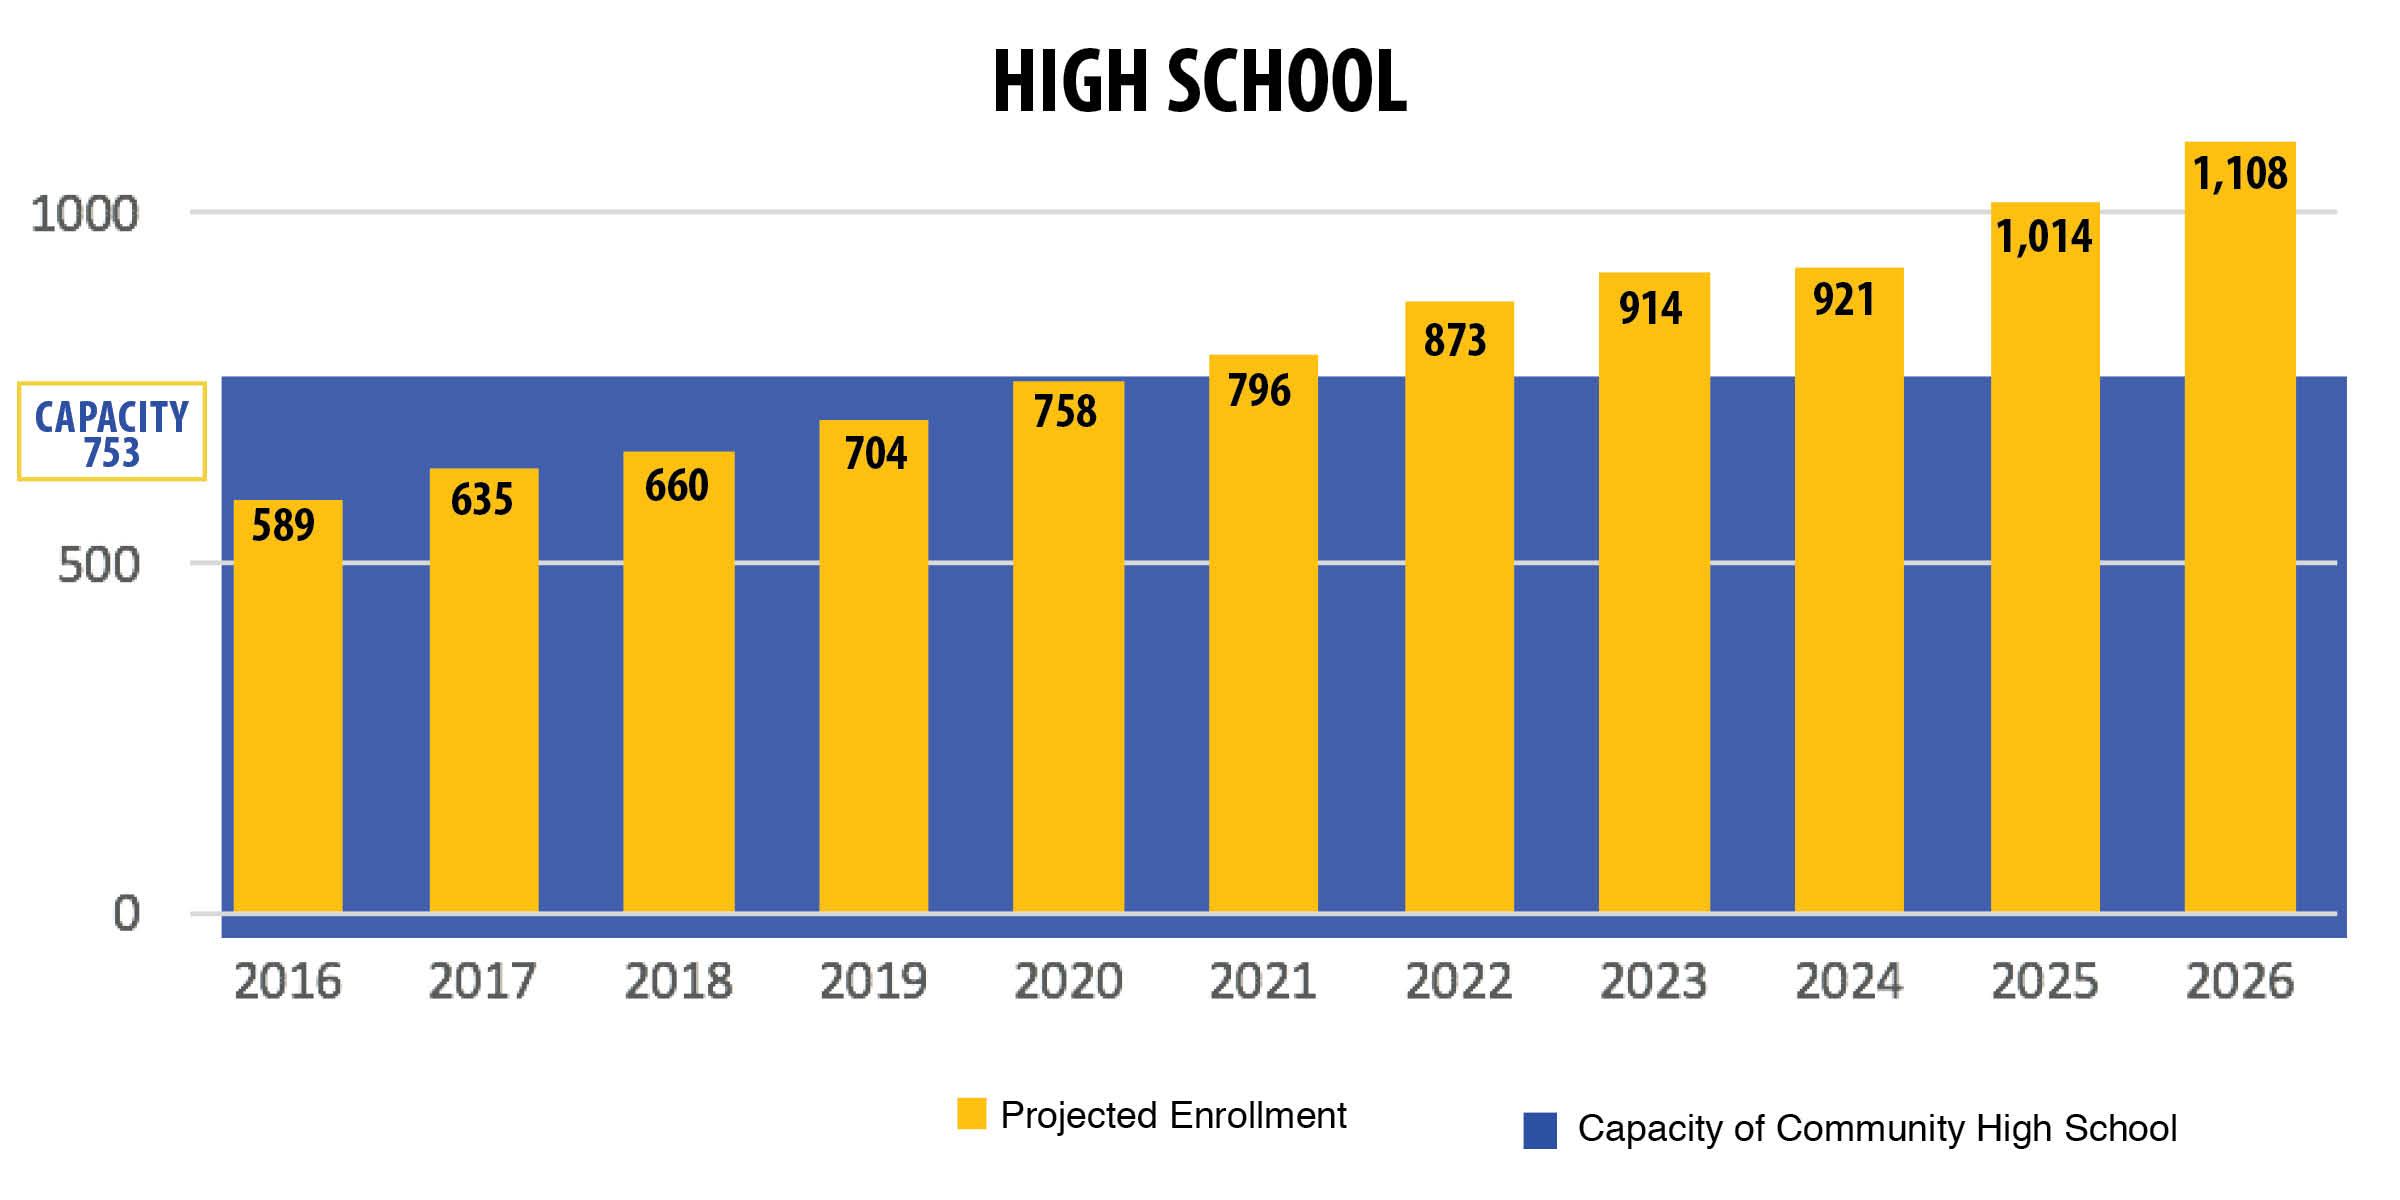 High School Capacity Bar Chart.jpg